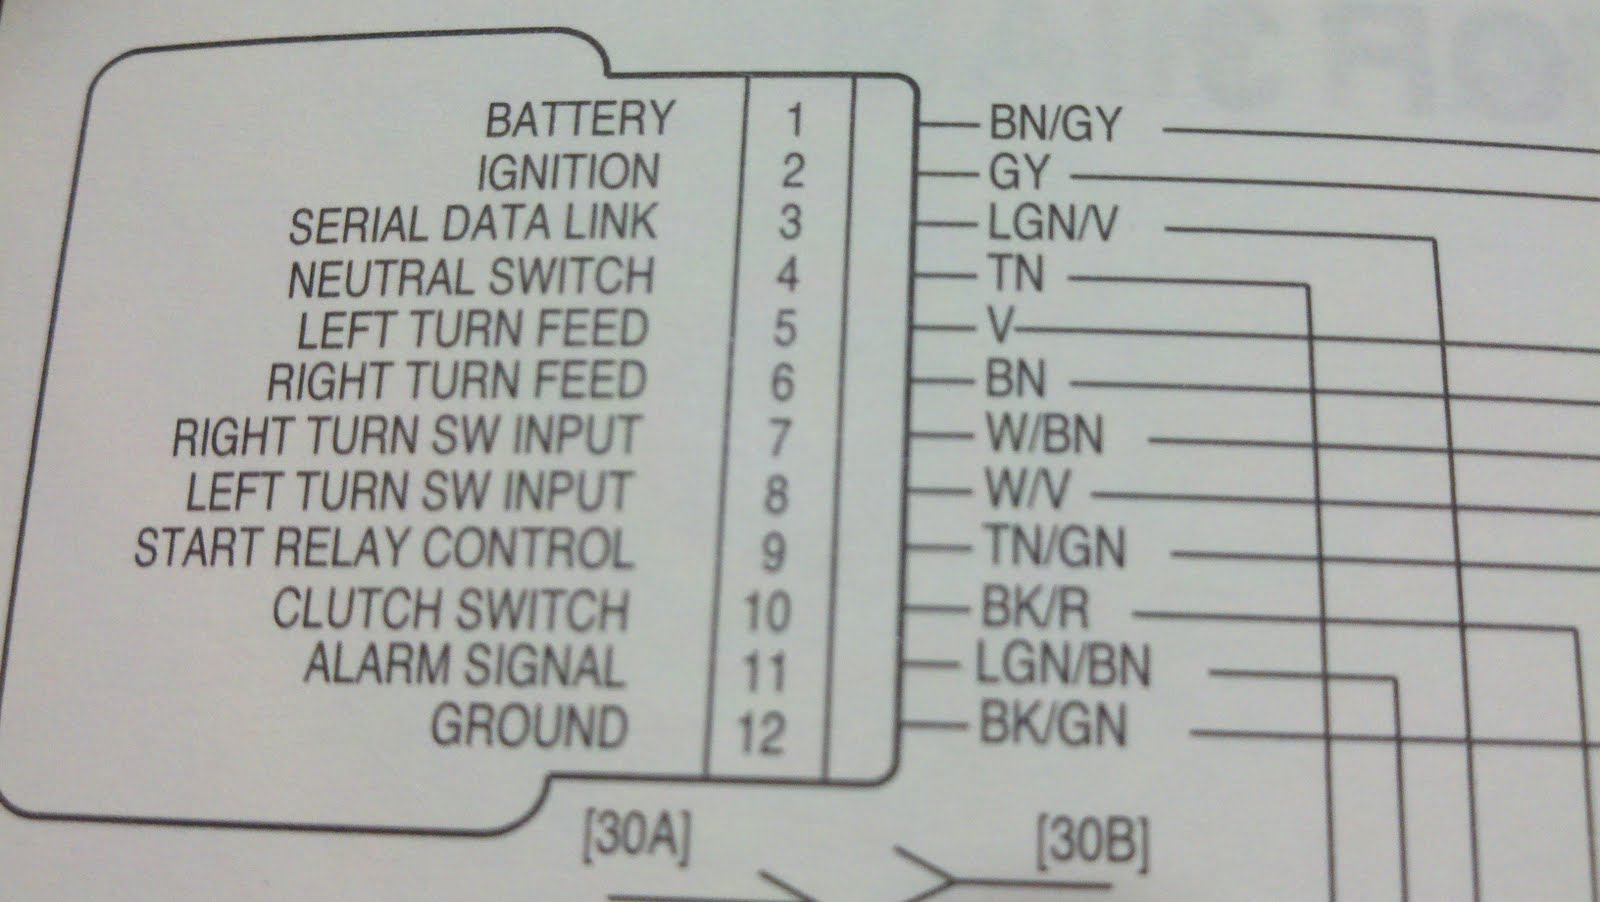 teleflex marine gauges wiring diagram 2003 toyota celica radio troubleshooting tachometer  readingrat